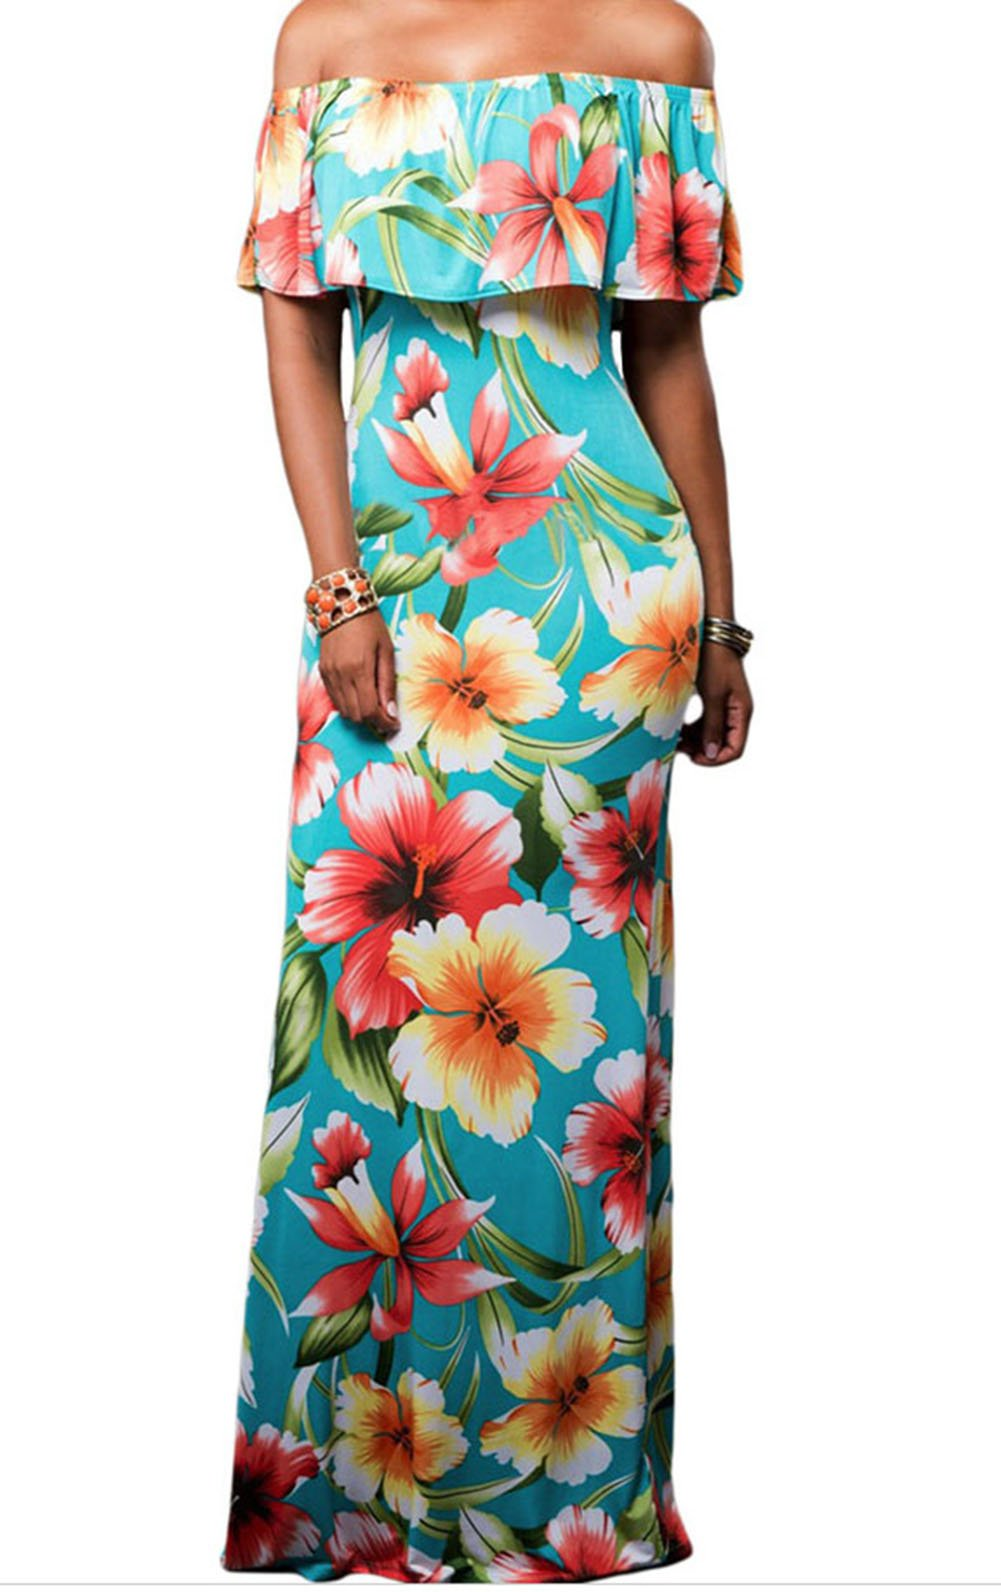 YeeATZ Print Off-the-shoulder Maxi Dress(Green,S) by YeeATZ